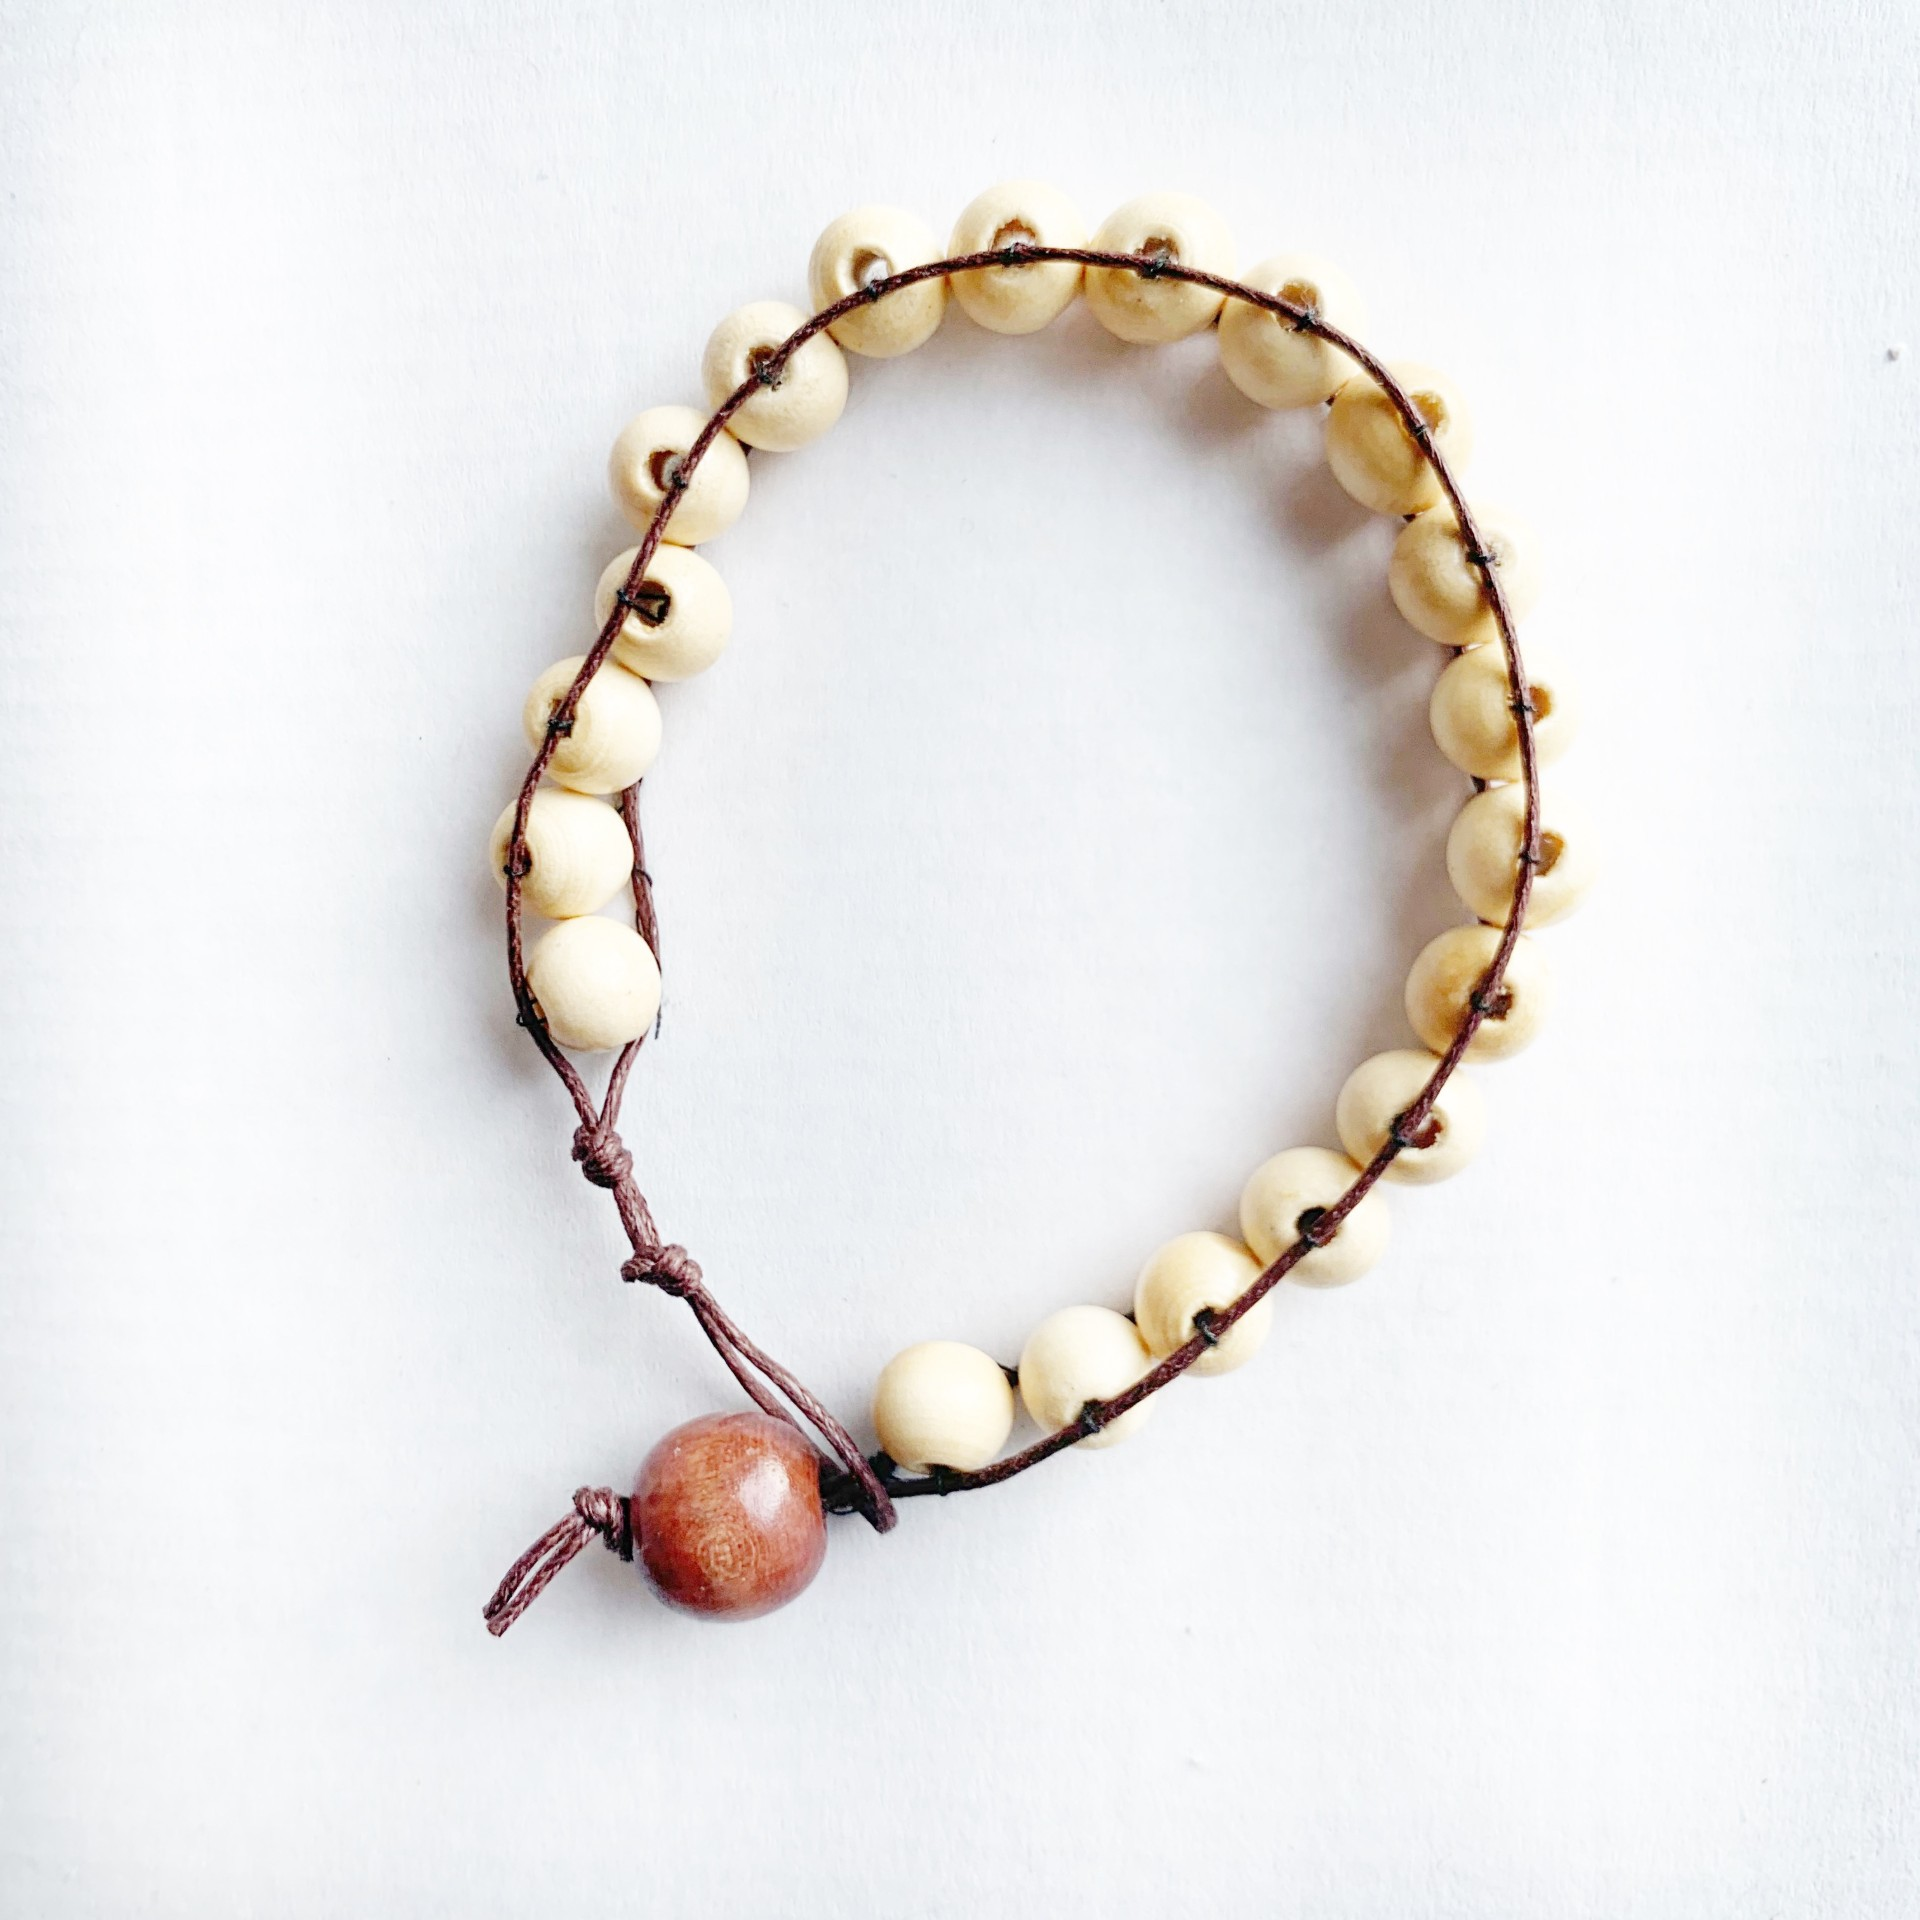 Tuesday Craft Corner: Beaded Wrap Bracelet